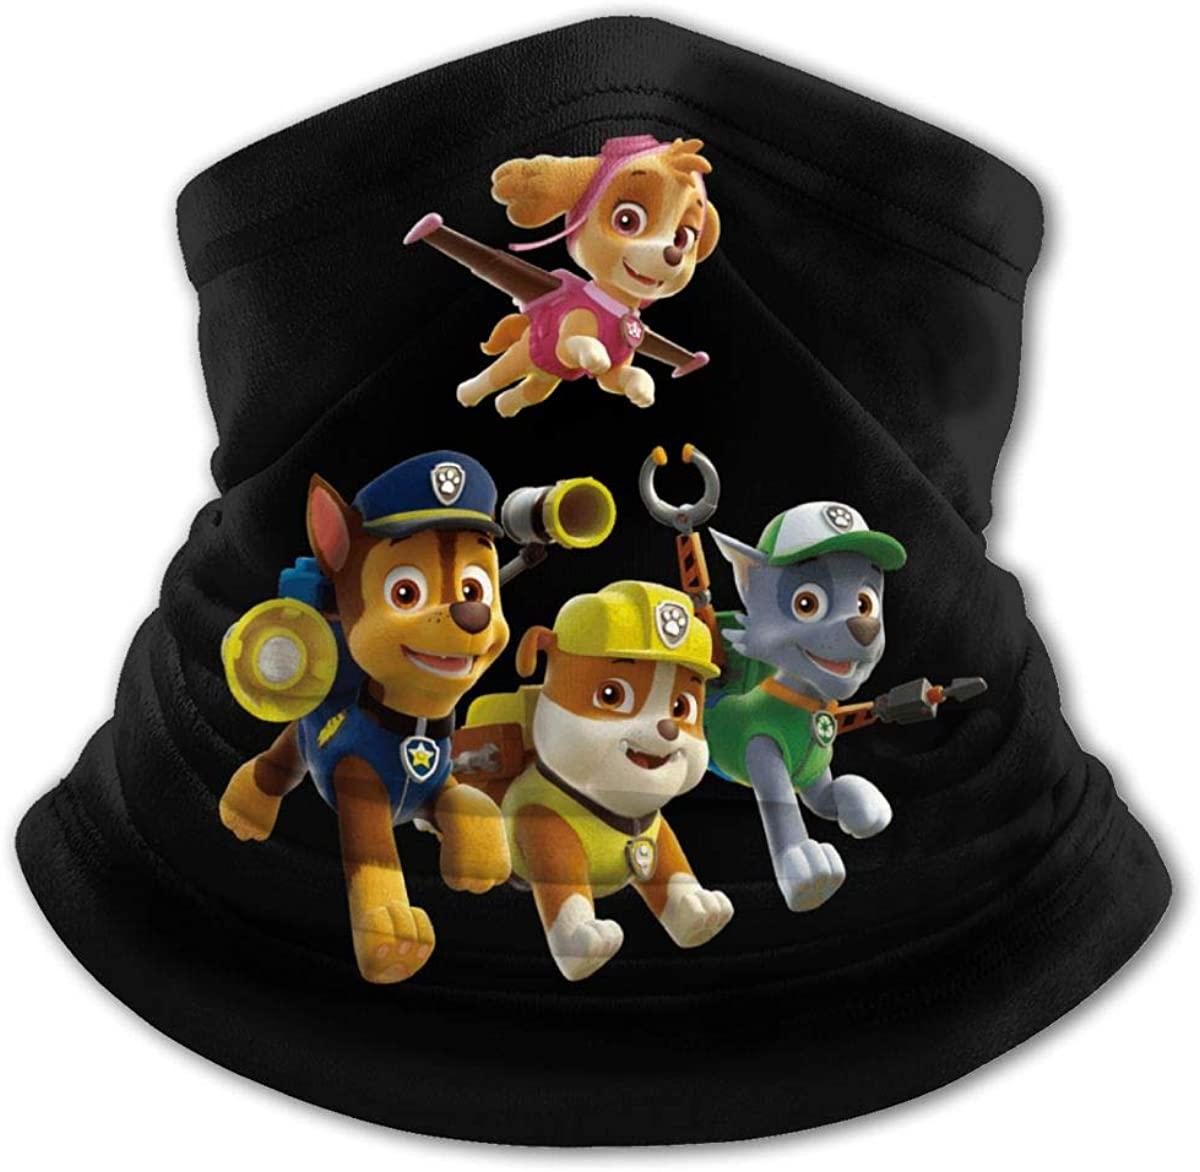 Head Scarf, Paw_Patrol Friends Windproof Face Mask Headbands Bandana Head Wrap Balaclava for Youth Boys Girls